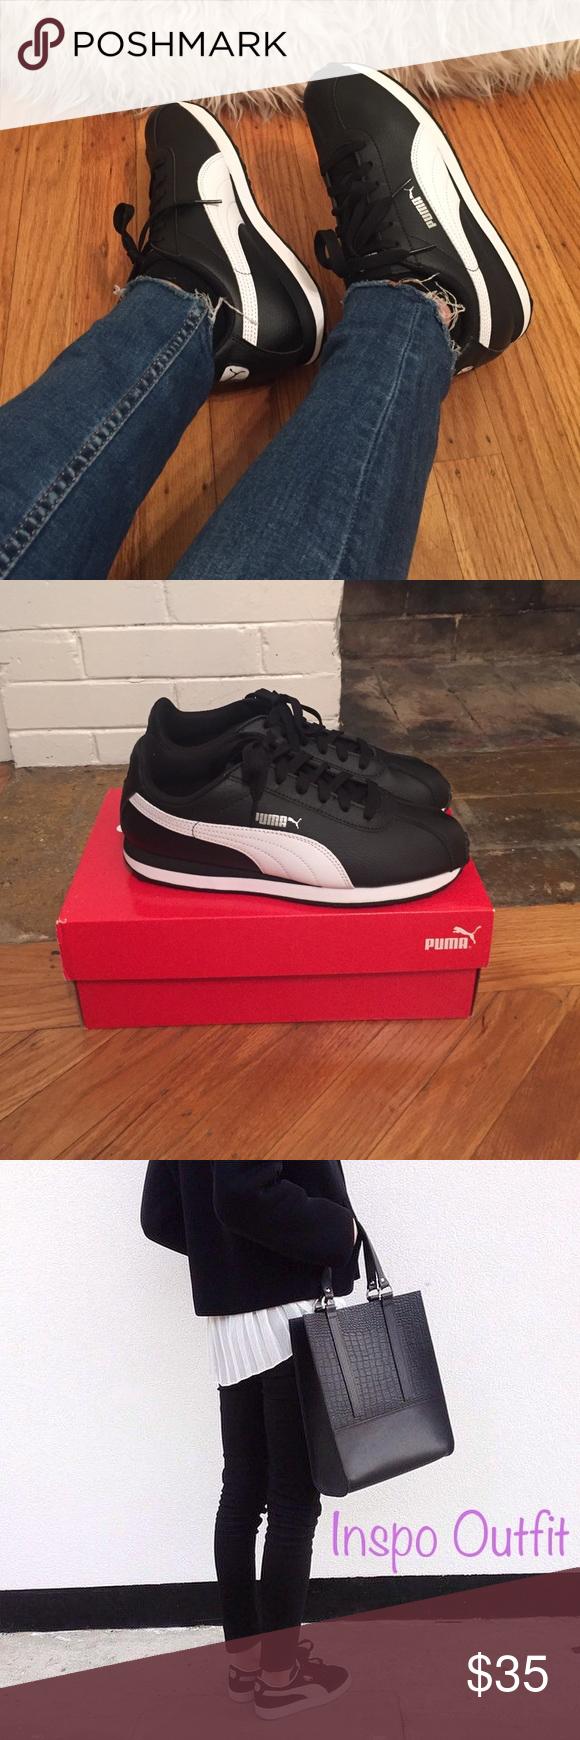 Puma Turin Sneakers Black & White Puma Turin Sneakers